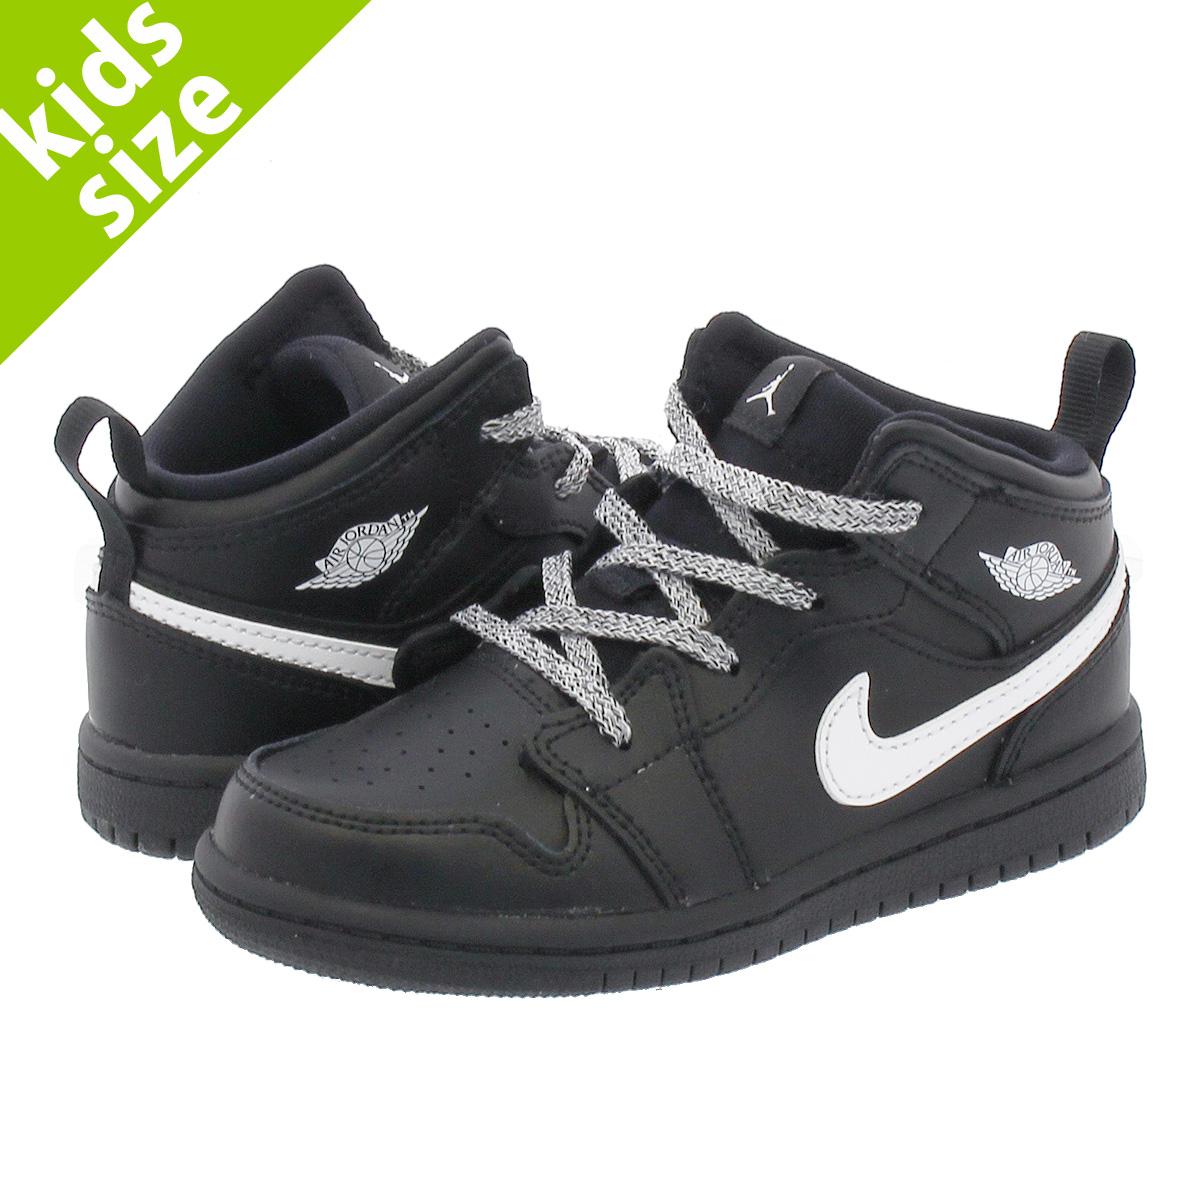 dc82ddfbac0f8c SELECT SHOP LOWTEX  NIKE AIR JORDAN 1 MID BT Nike Air Jordan 1 mid ...